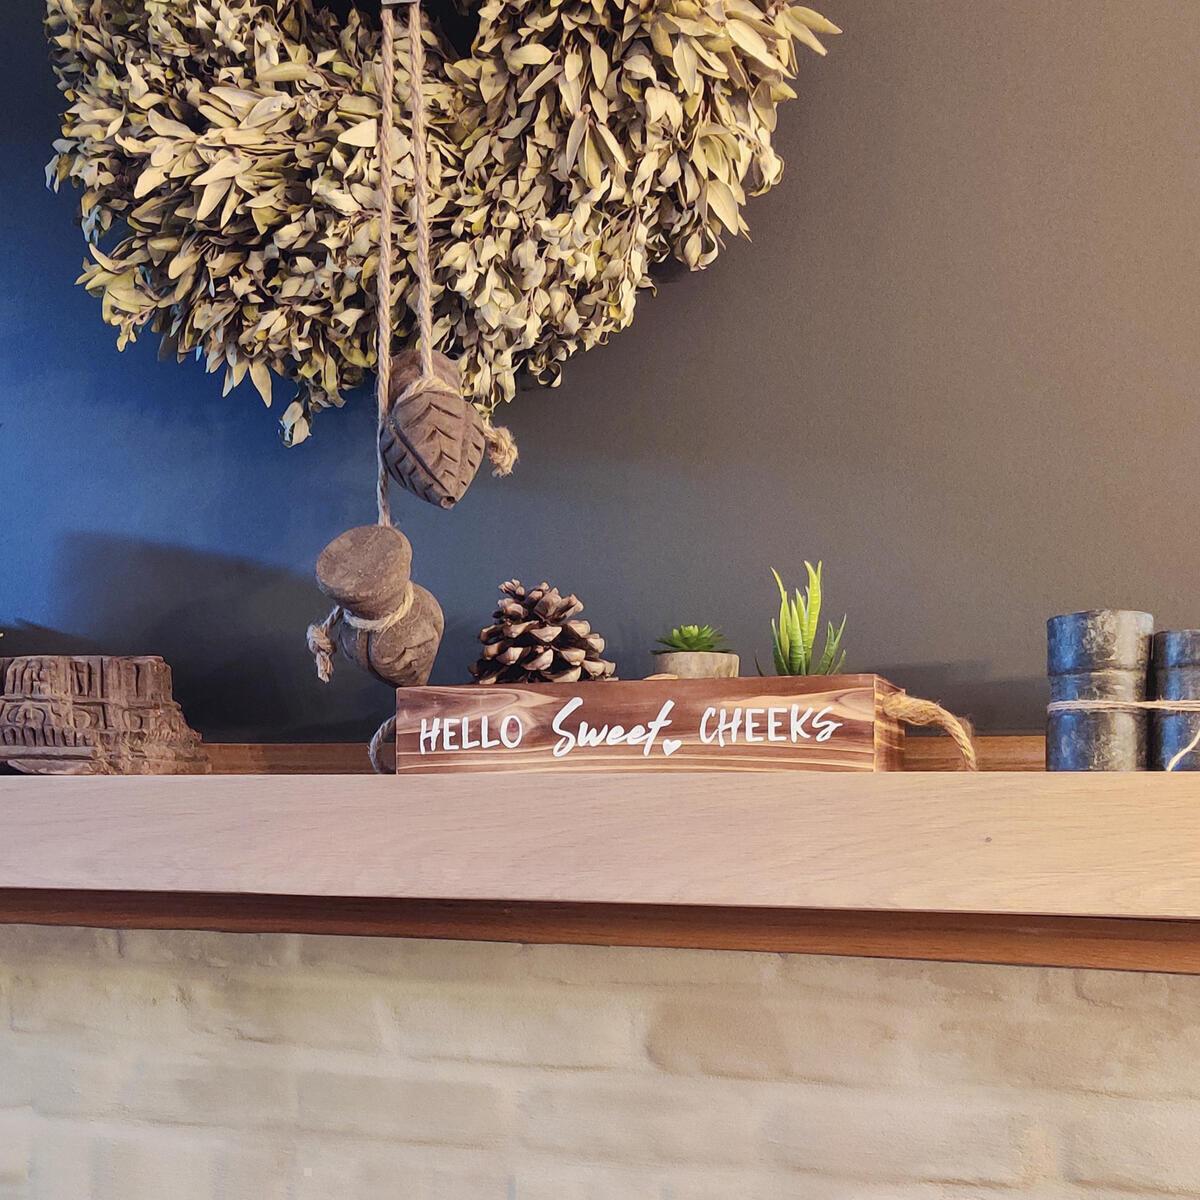 Nice Butt Bathroom Decor Box & Artificial Plants (BUNDLE): 2 Funny Sayings, Hello Sweet Cheeks, Bathroom Organizer, Toilet Paper Holder, Farmhouse Decor, 2 Artificial Succulent Plants Included, Brown